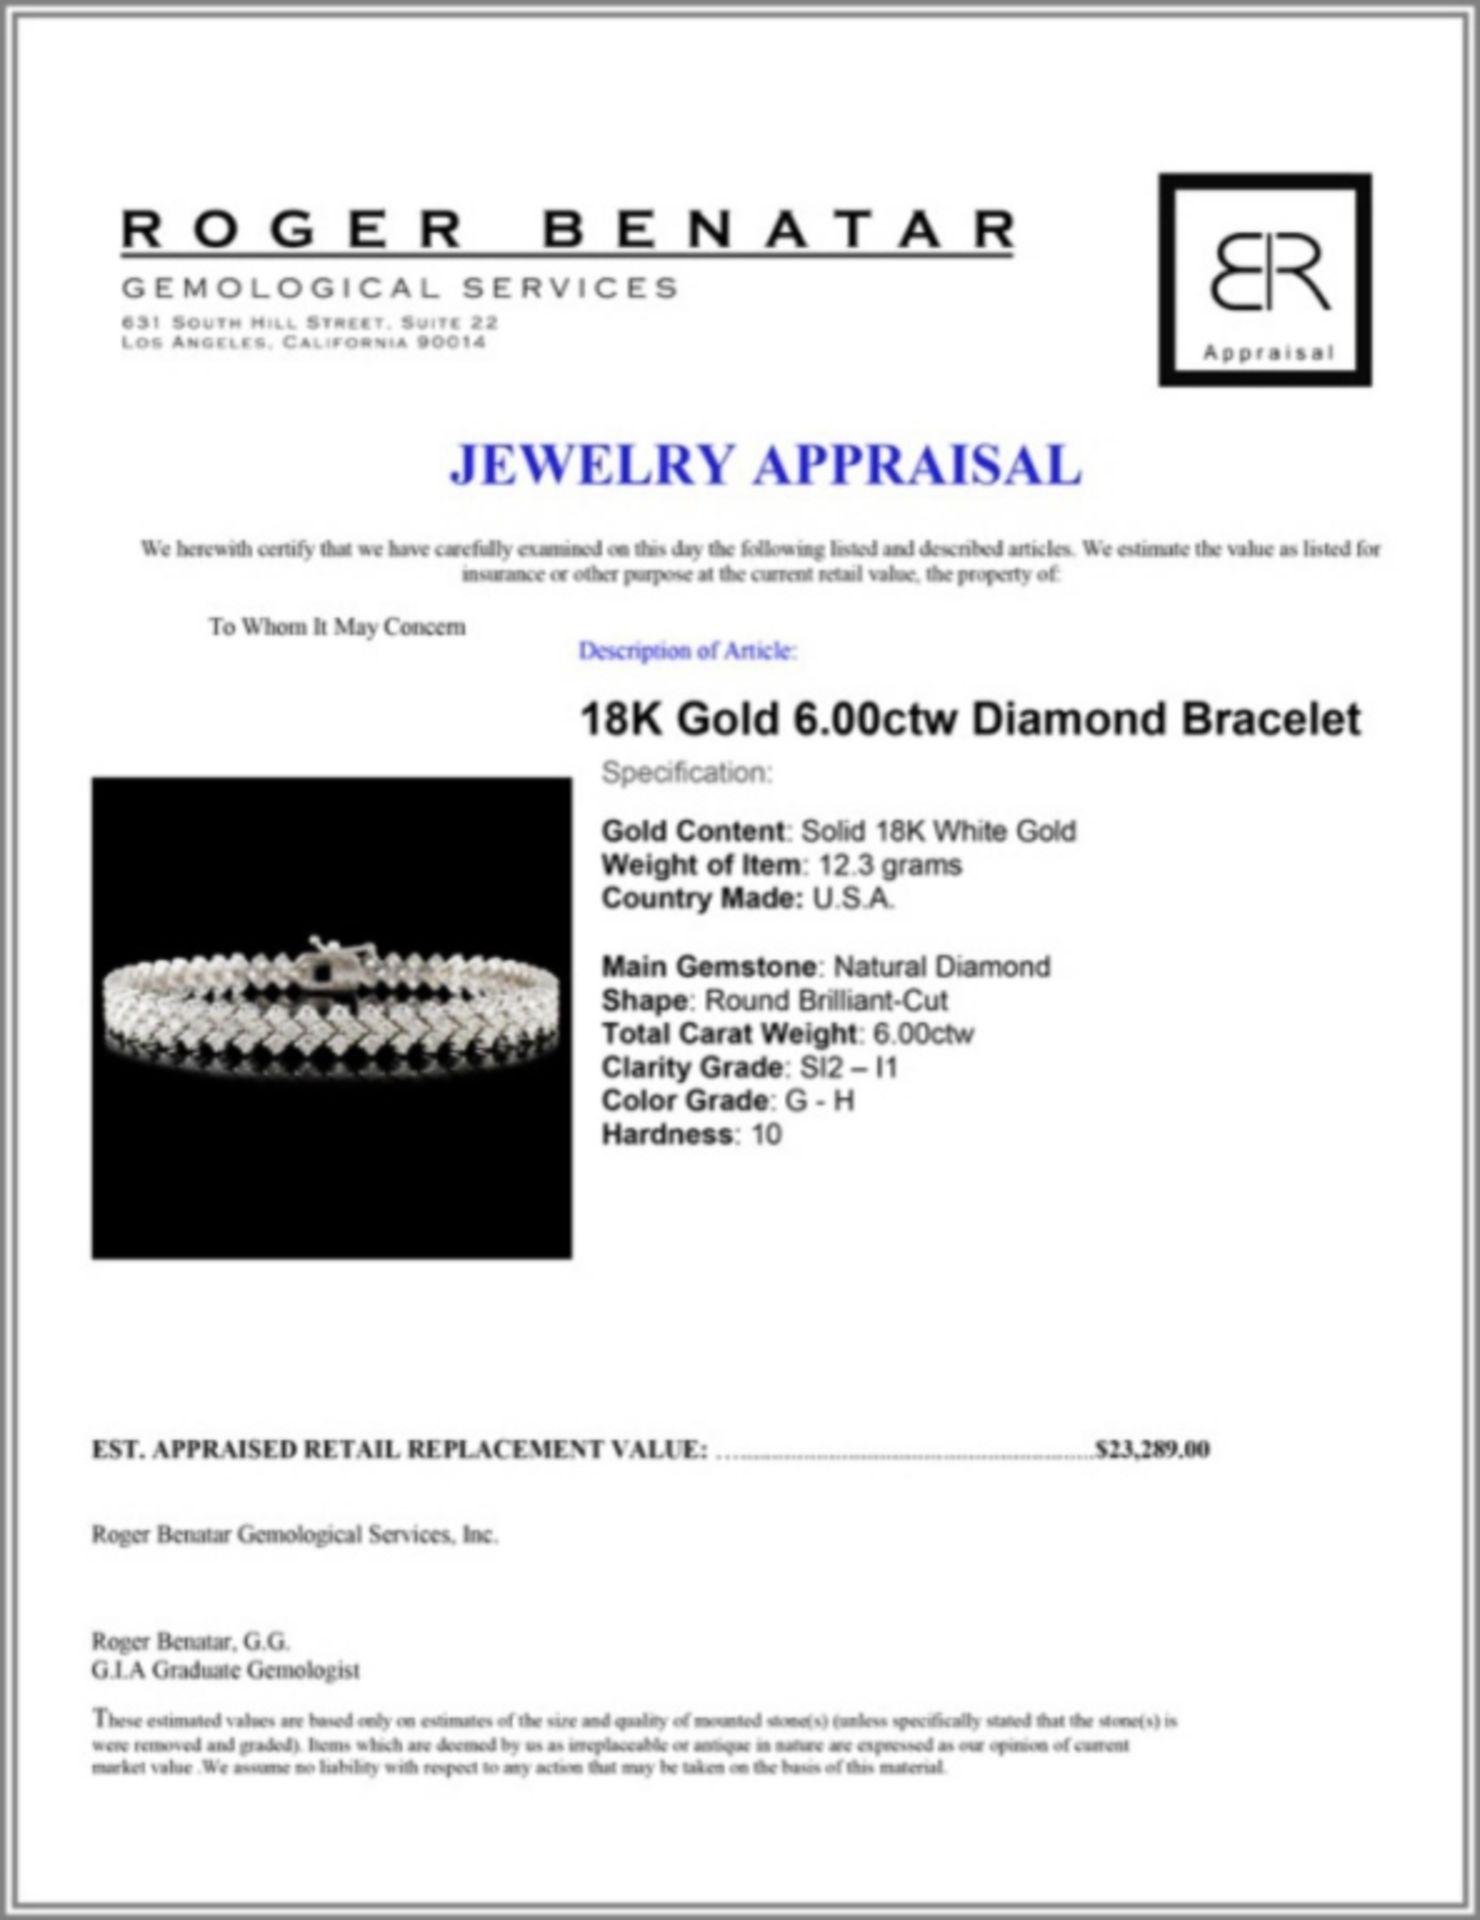 18K Gold 6.00ctw Diamond Bracelet - Image 3 of 3